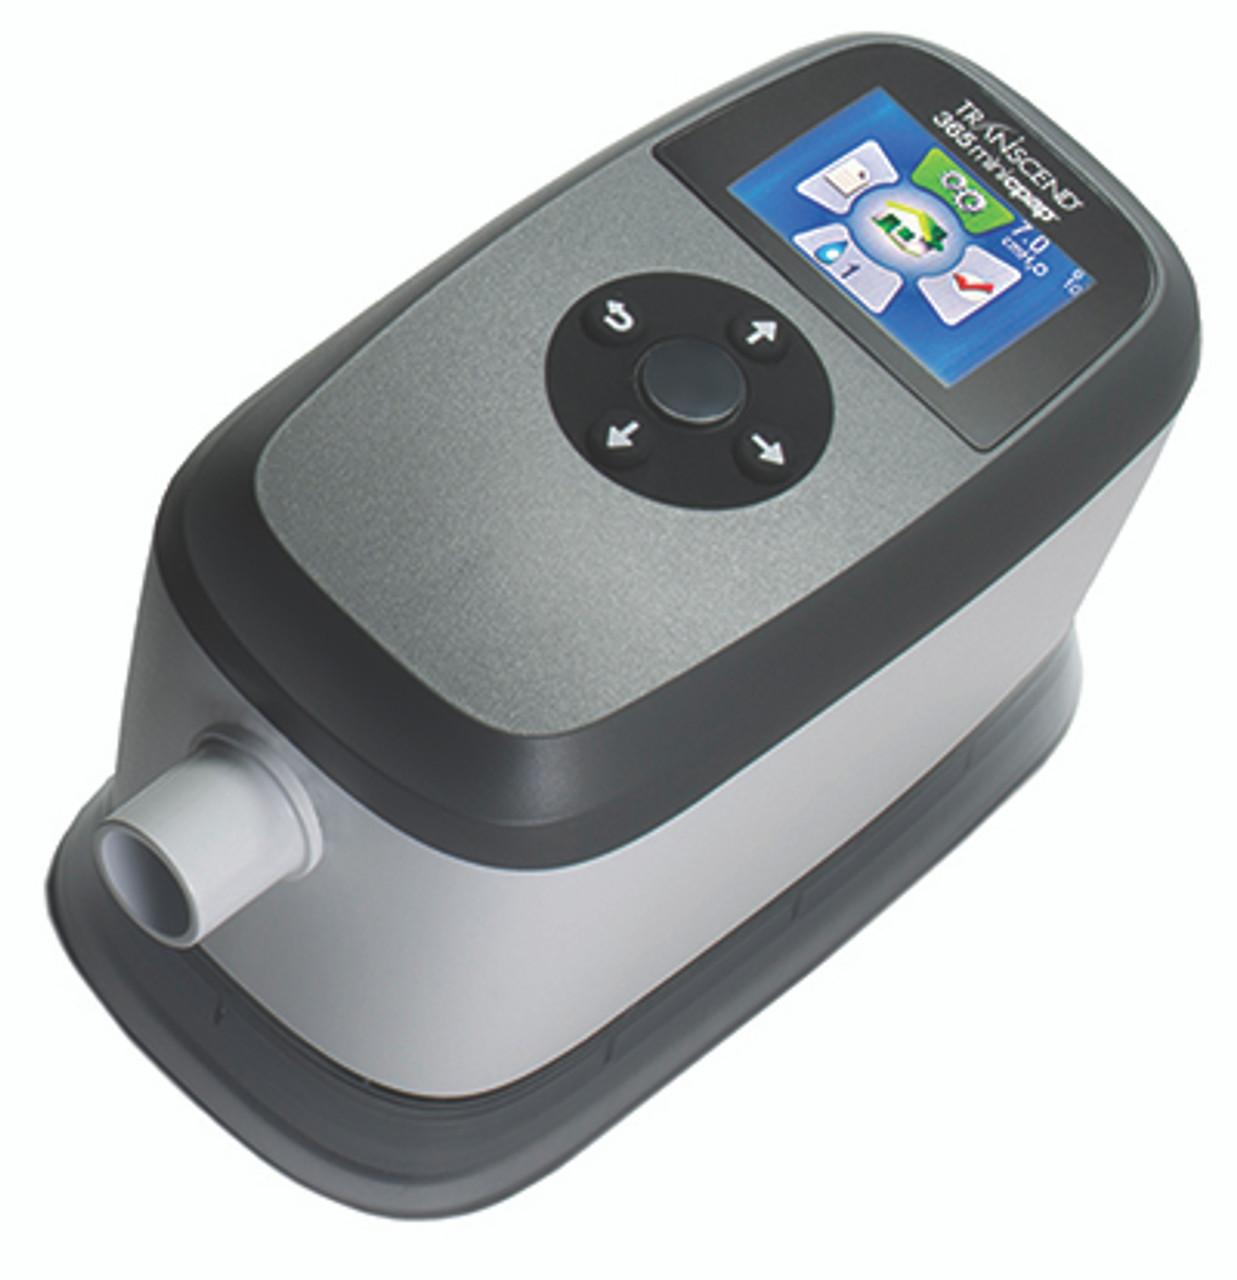 Buy Transcend 365 MiniCPAP Automatic Machine